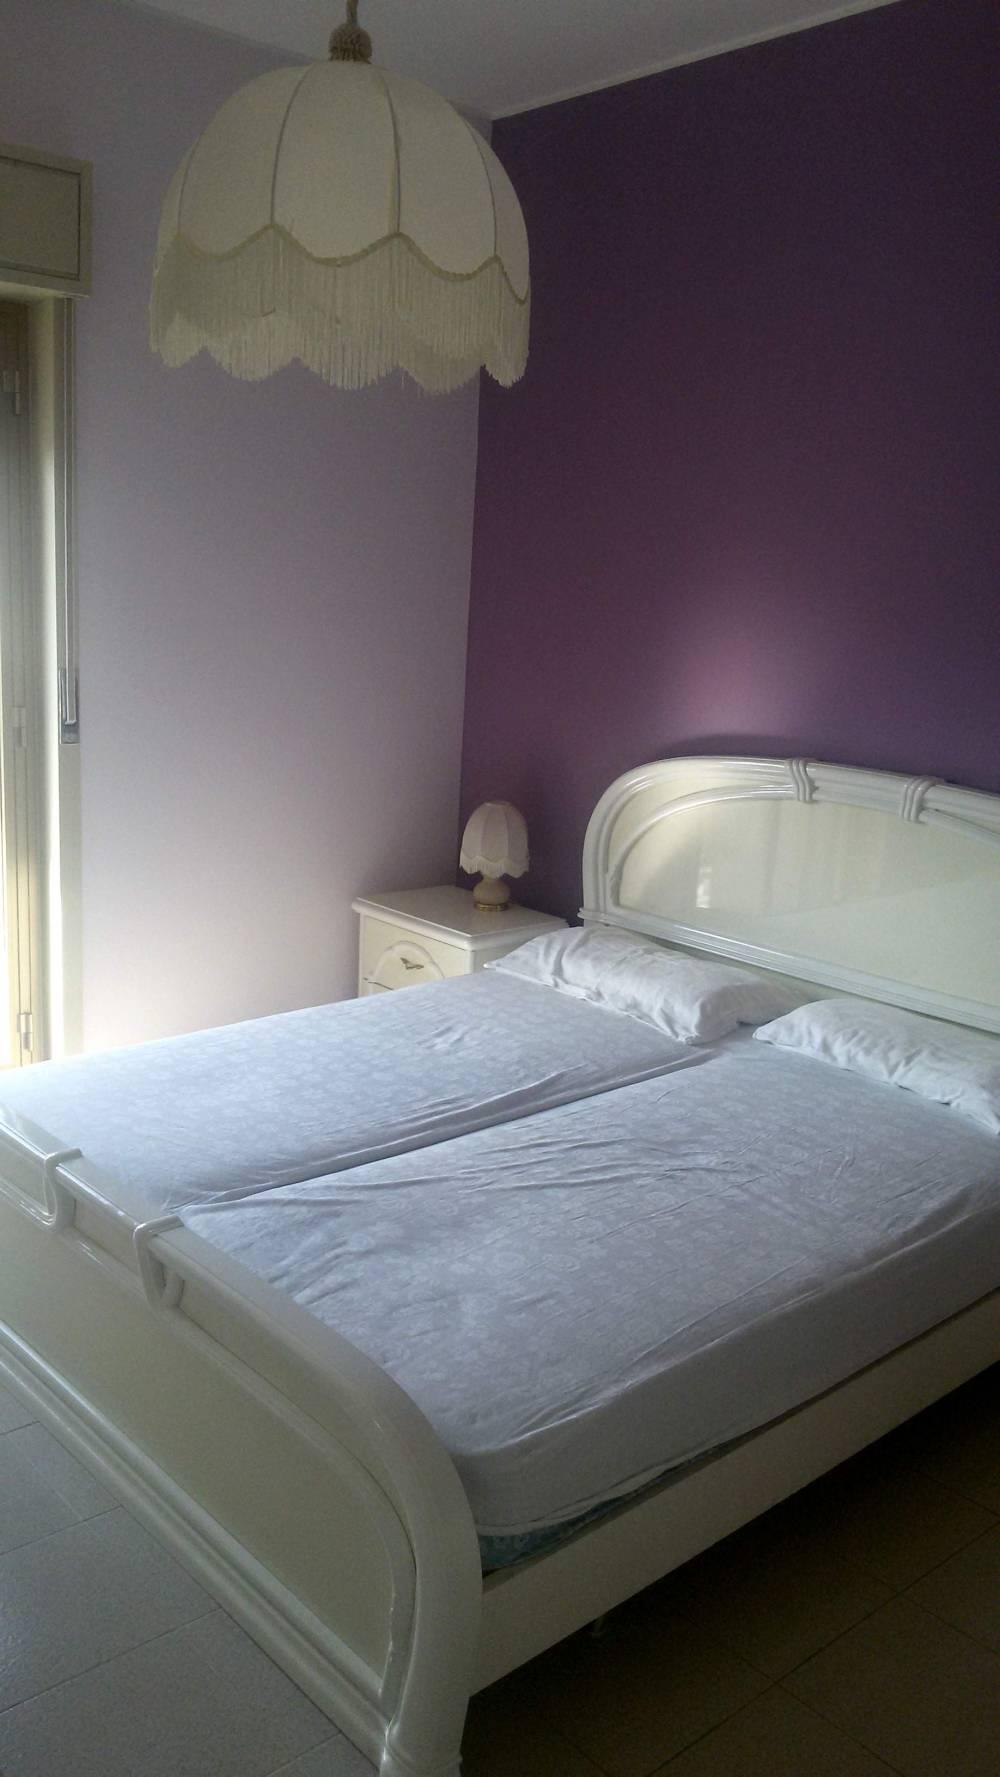 Camera da letto - Casa n vendita a Capo d'Orlando CD15VF